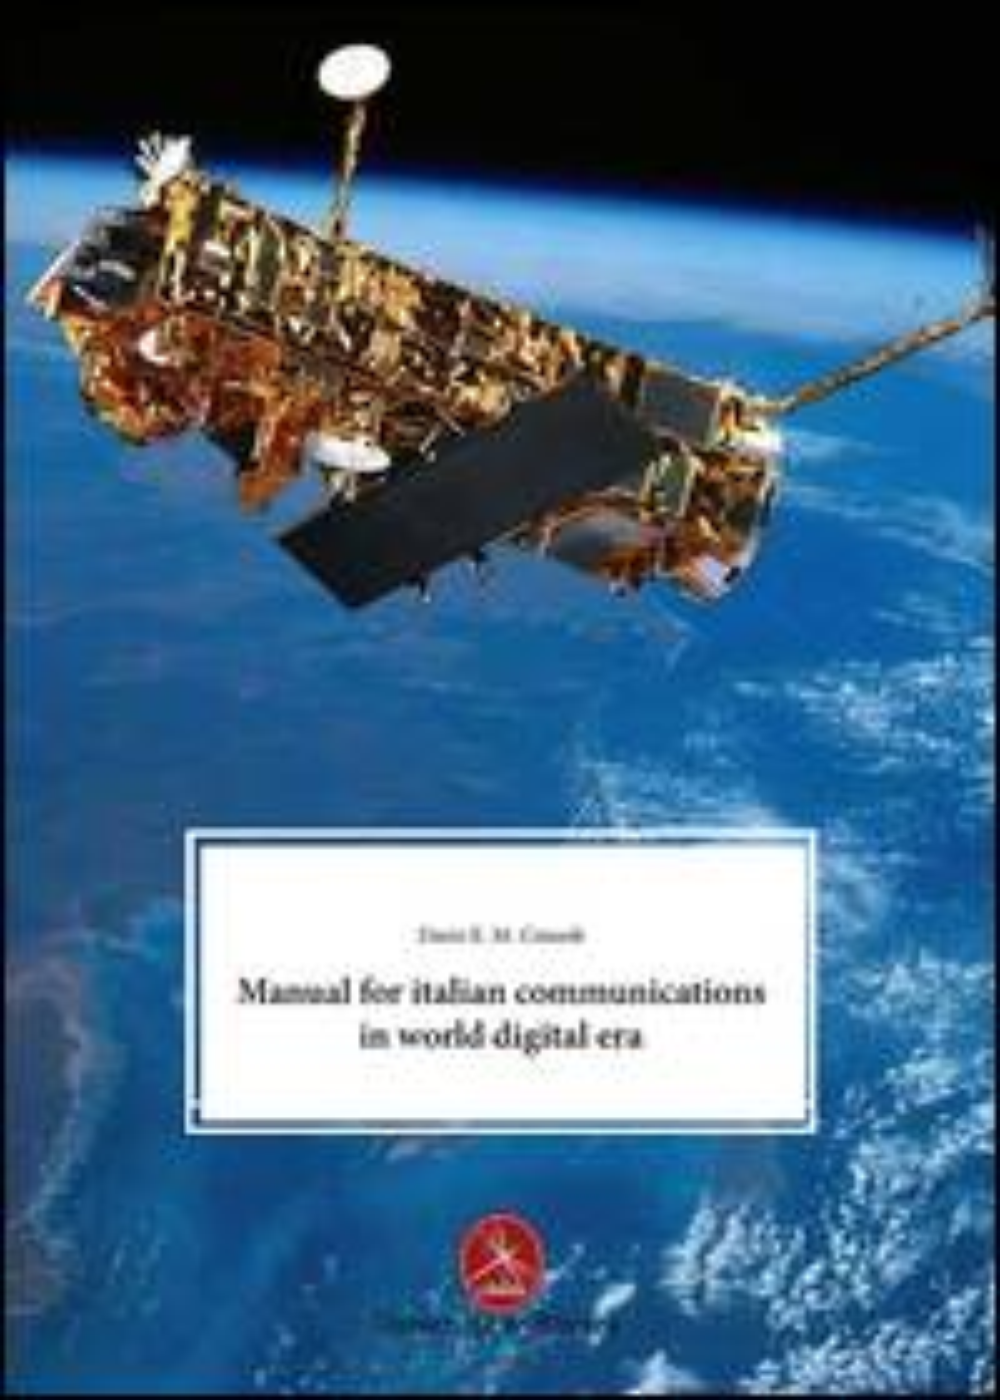 Dario E. Consoli Manual for italian communications in world digital era ISBN:9788896818343